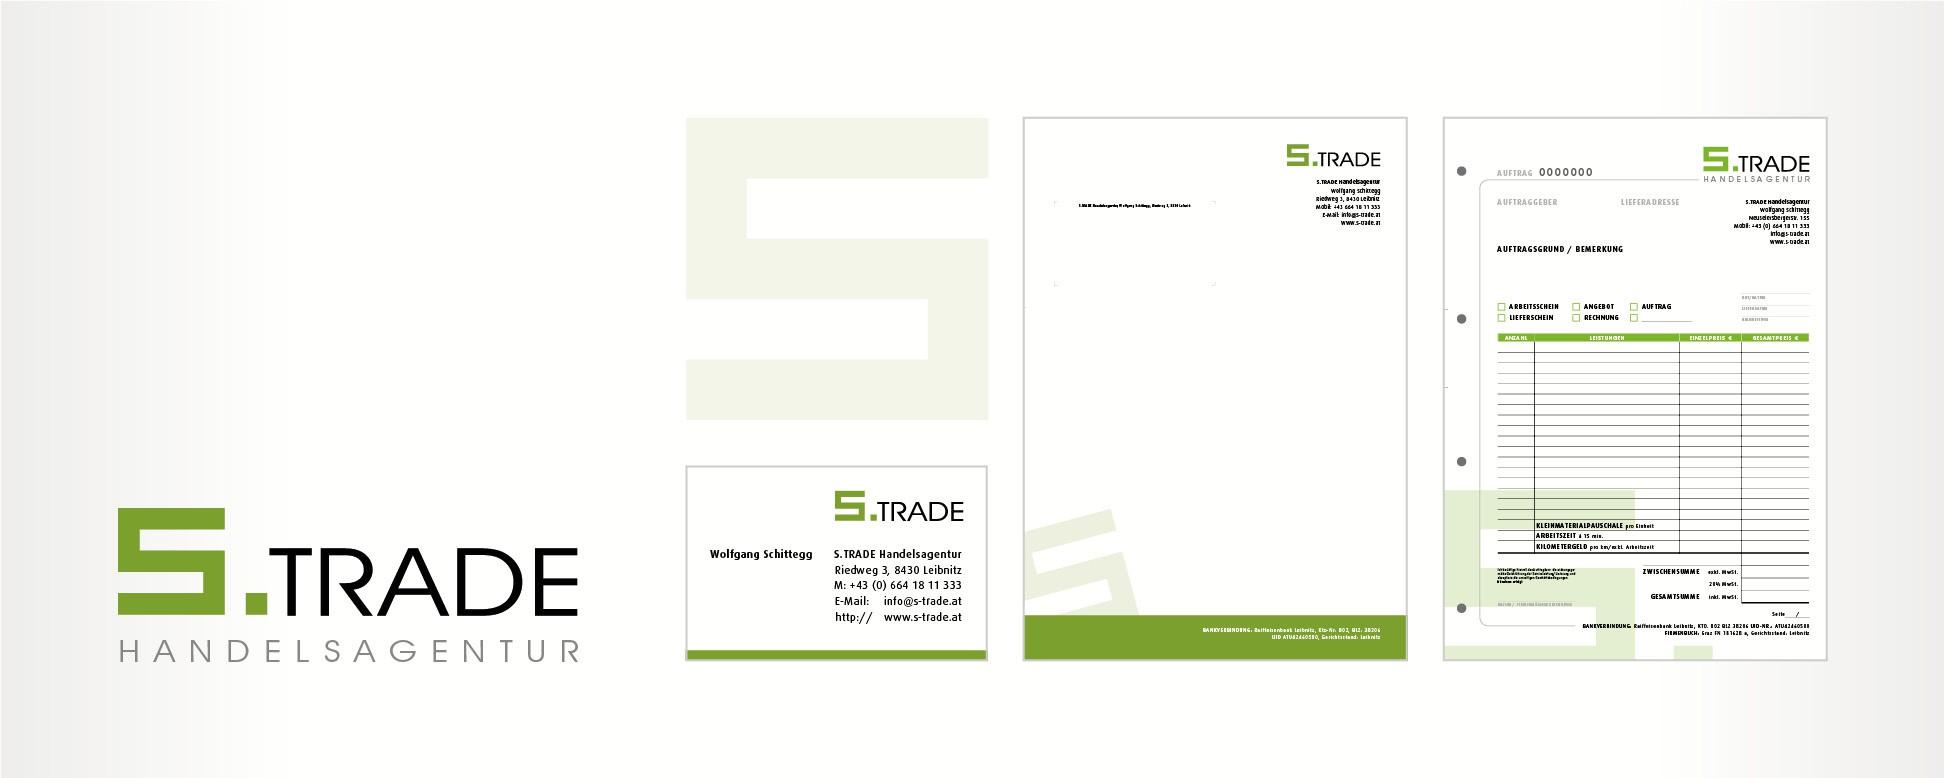 s-trade